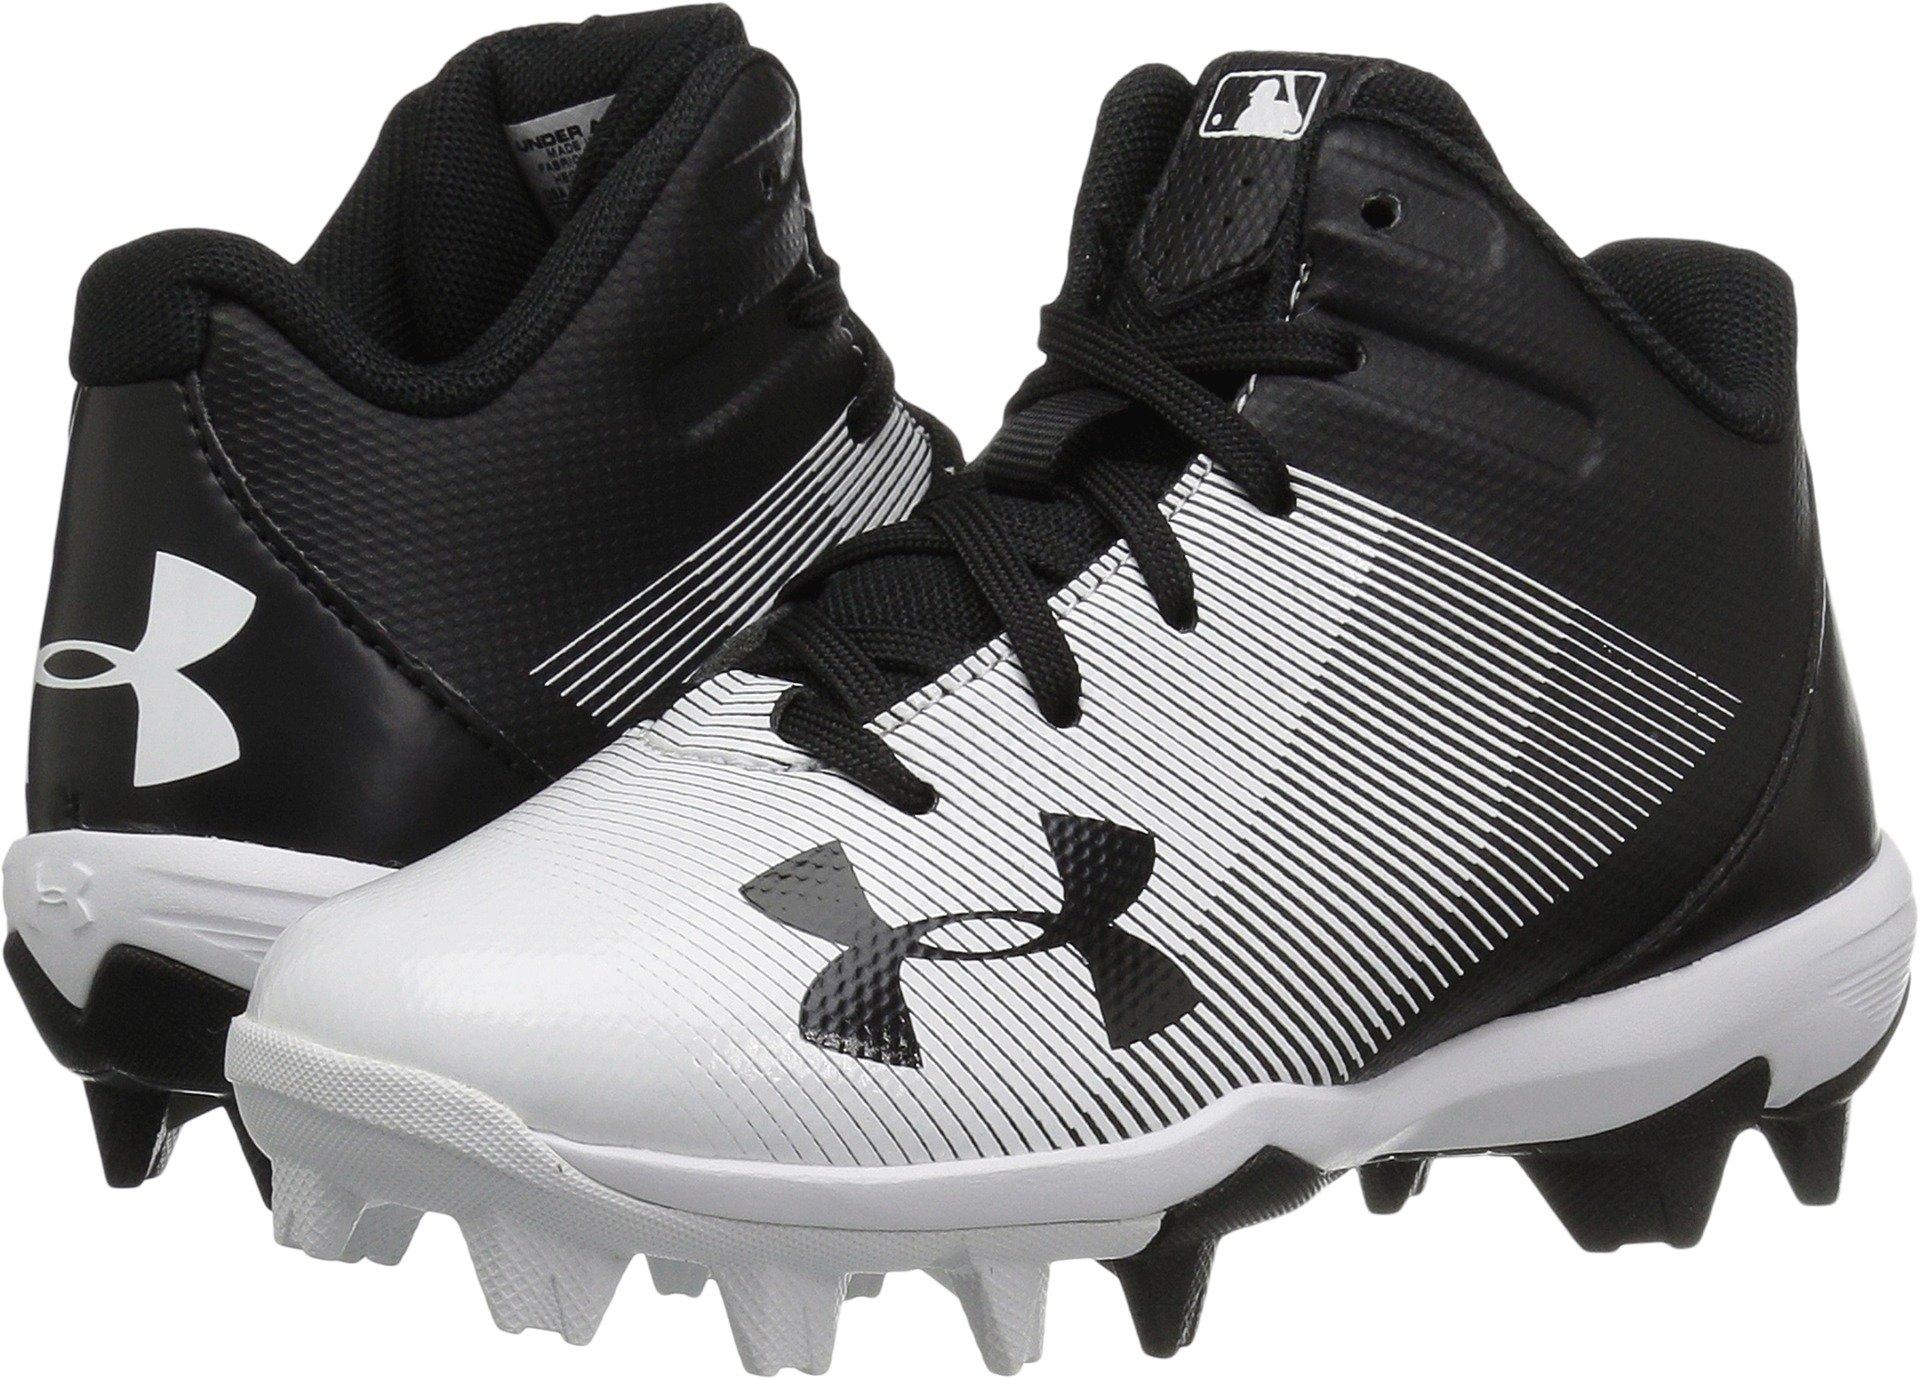 Under Armour Boys' Leadoff Mid Jr. RM Baseball Shoe, Black (011)/White, 2